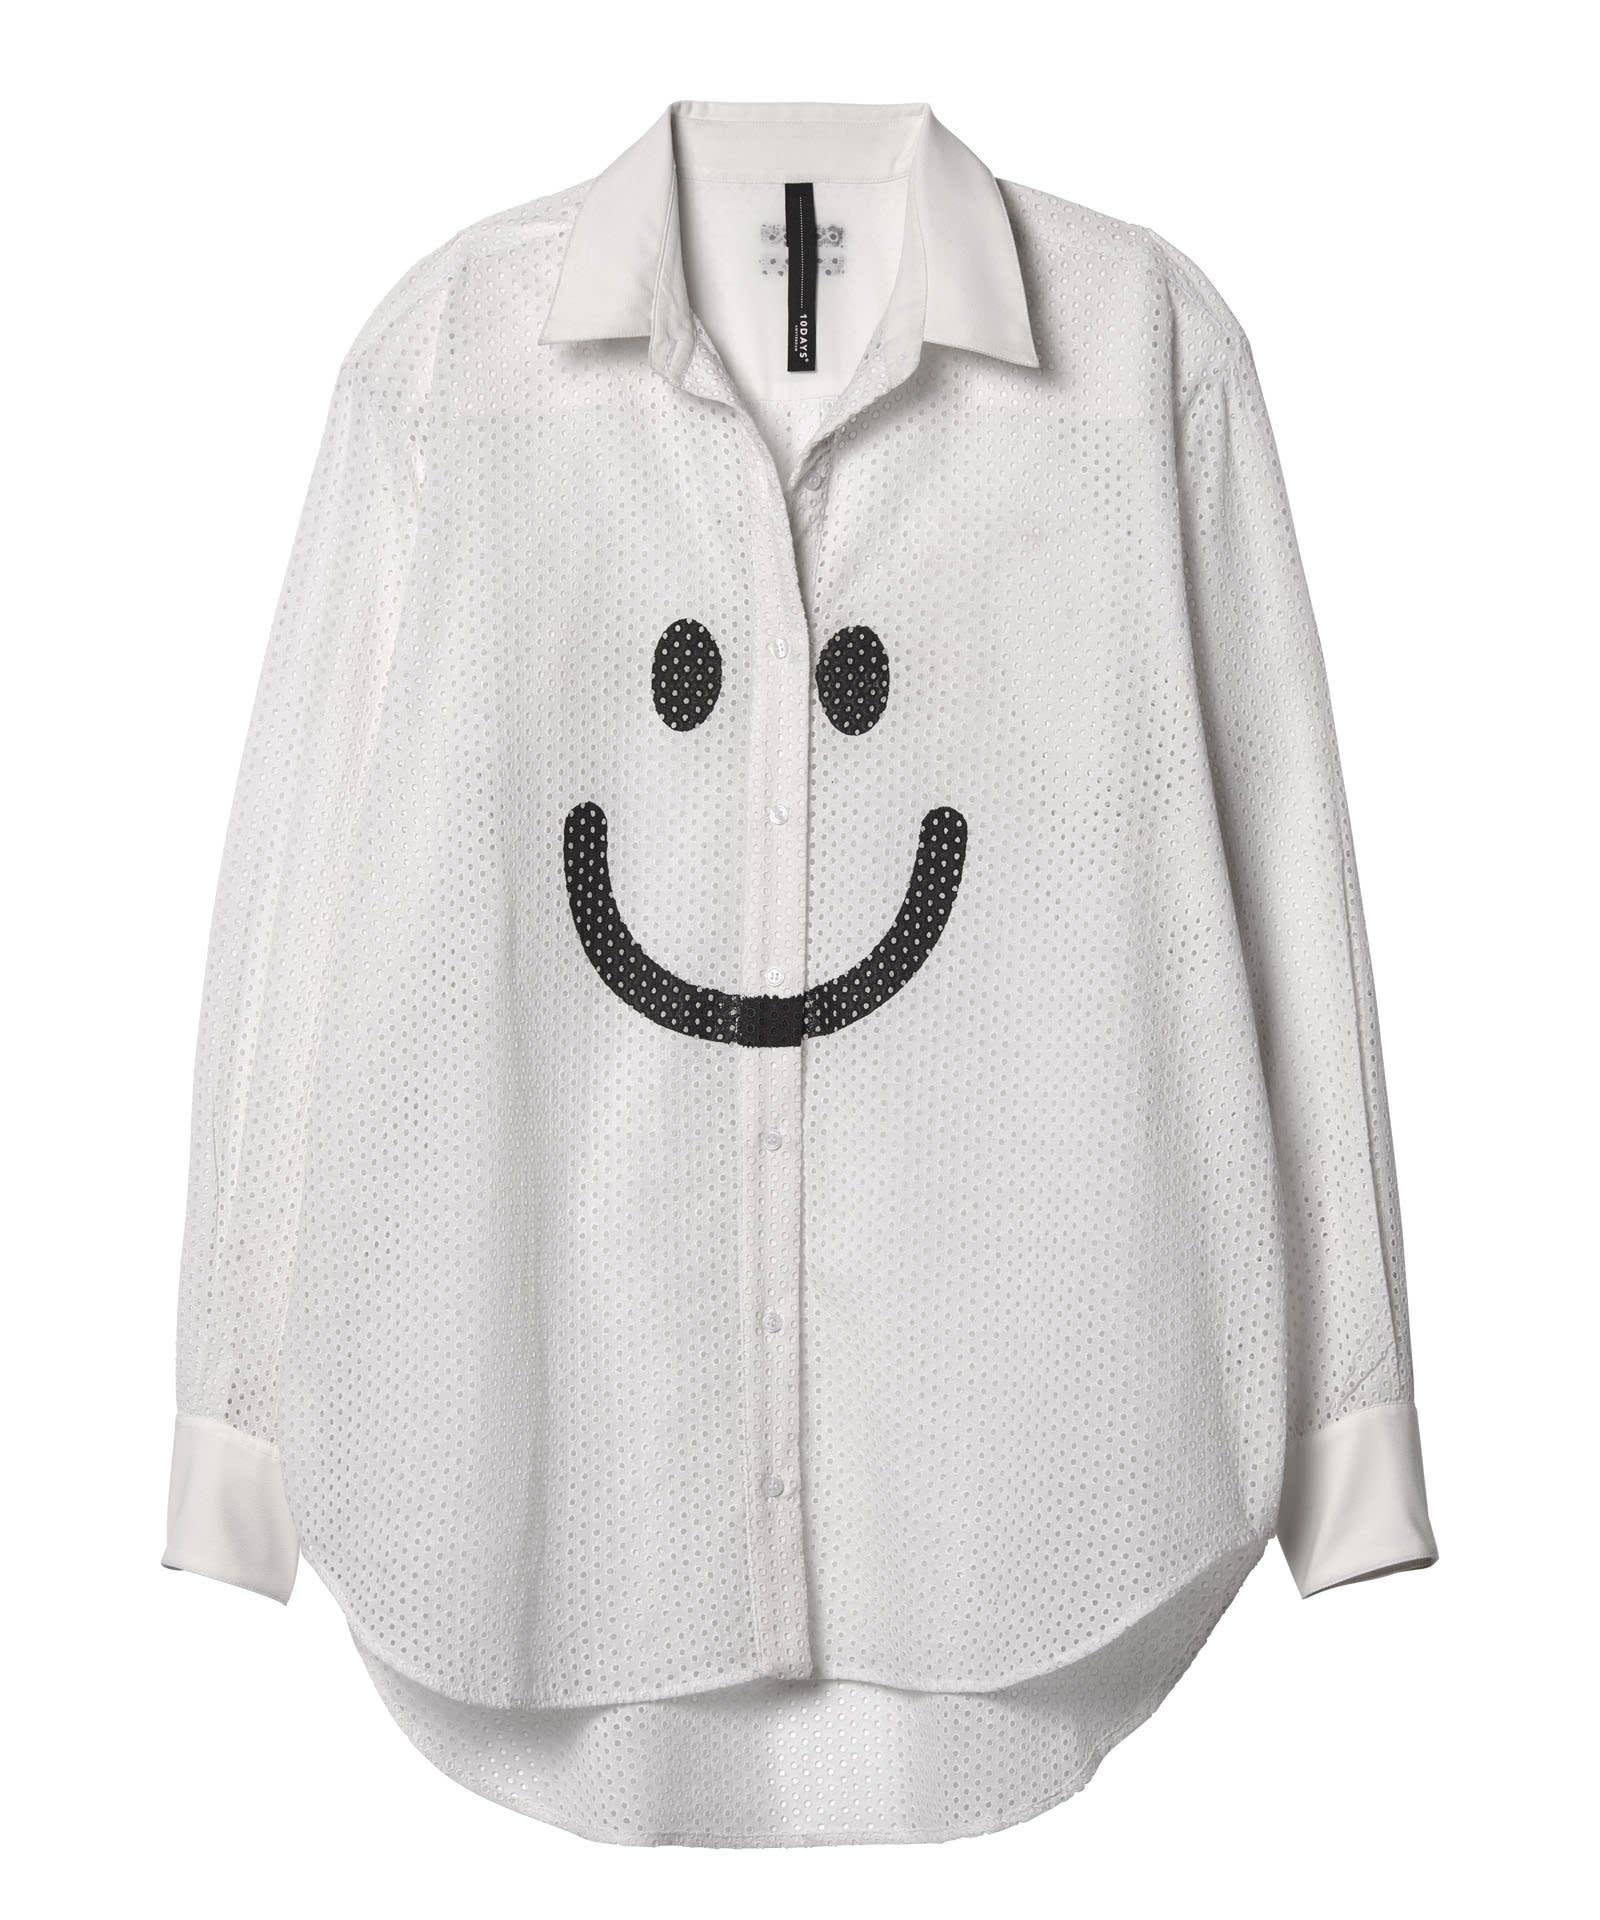 Blouse happy white-1